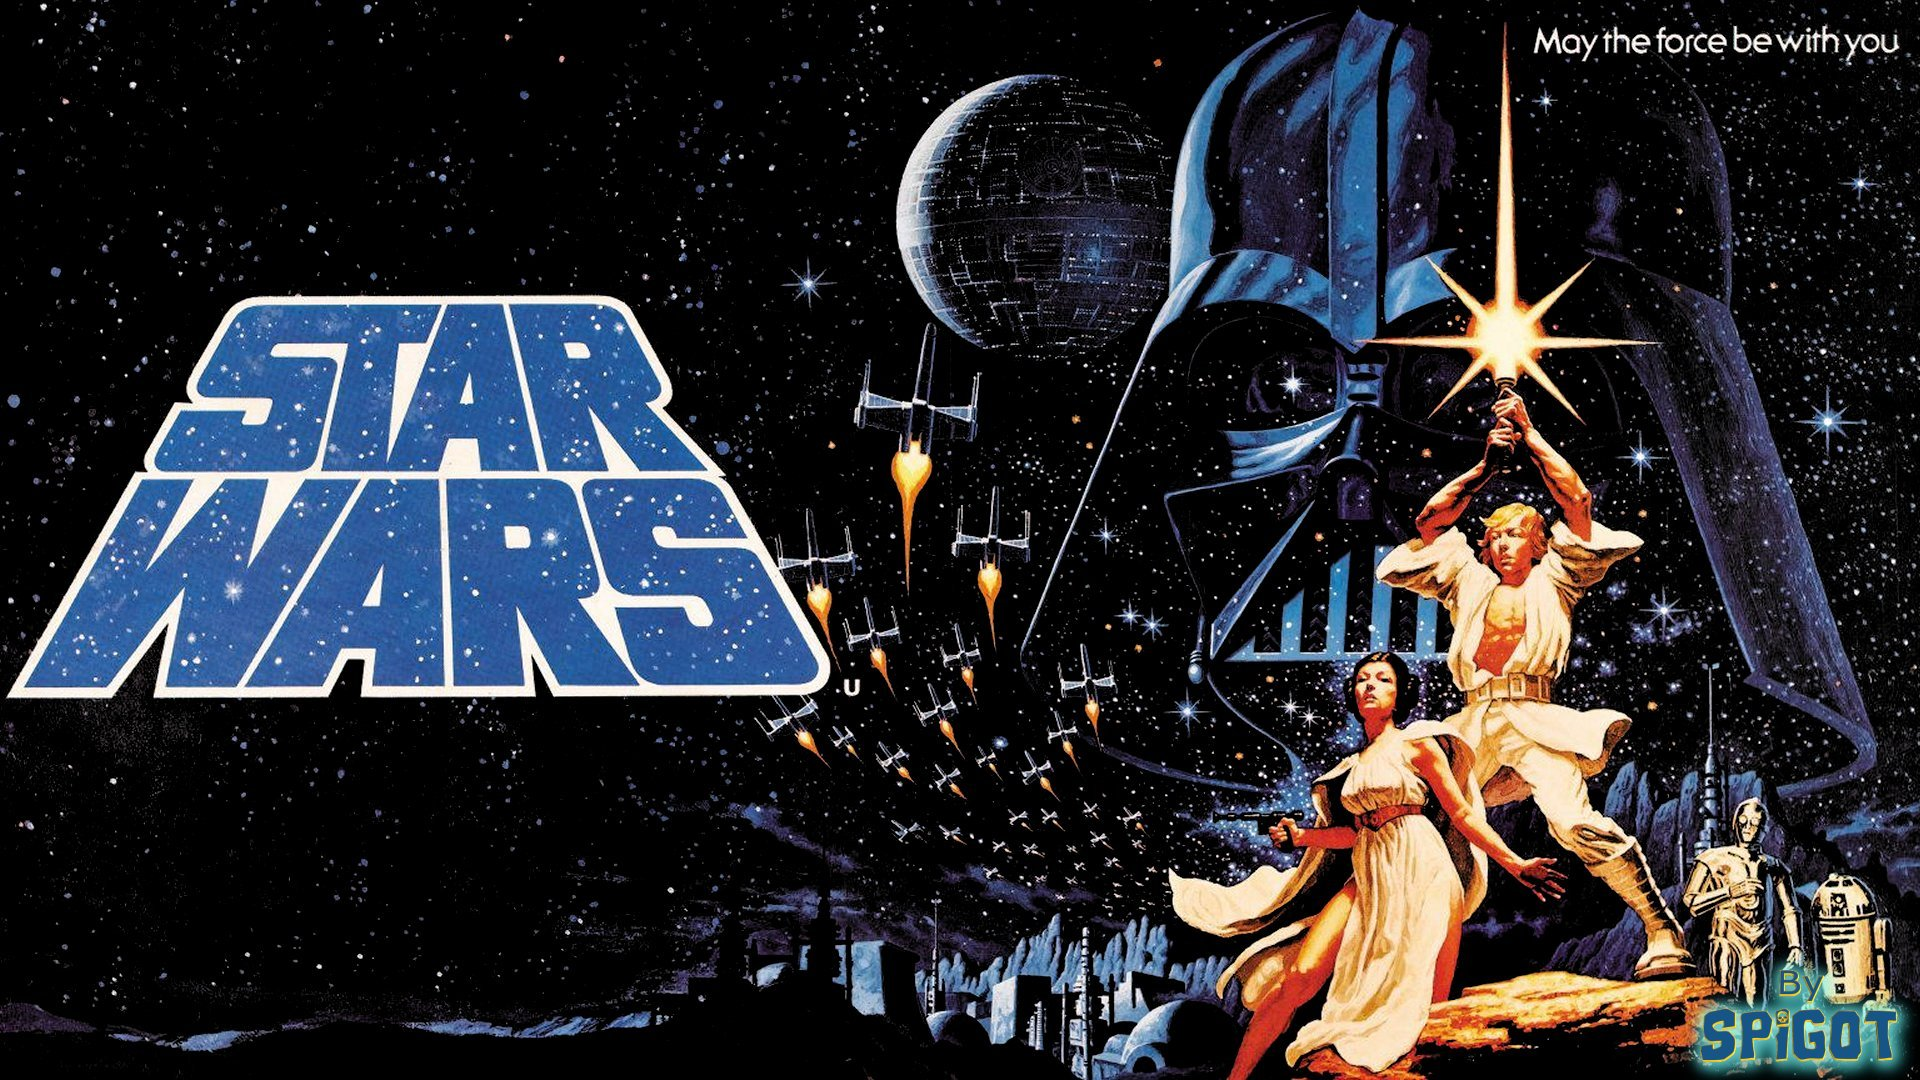 Starwars Wallpaper Cellphone: Star Wars Mobile Wallpapers